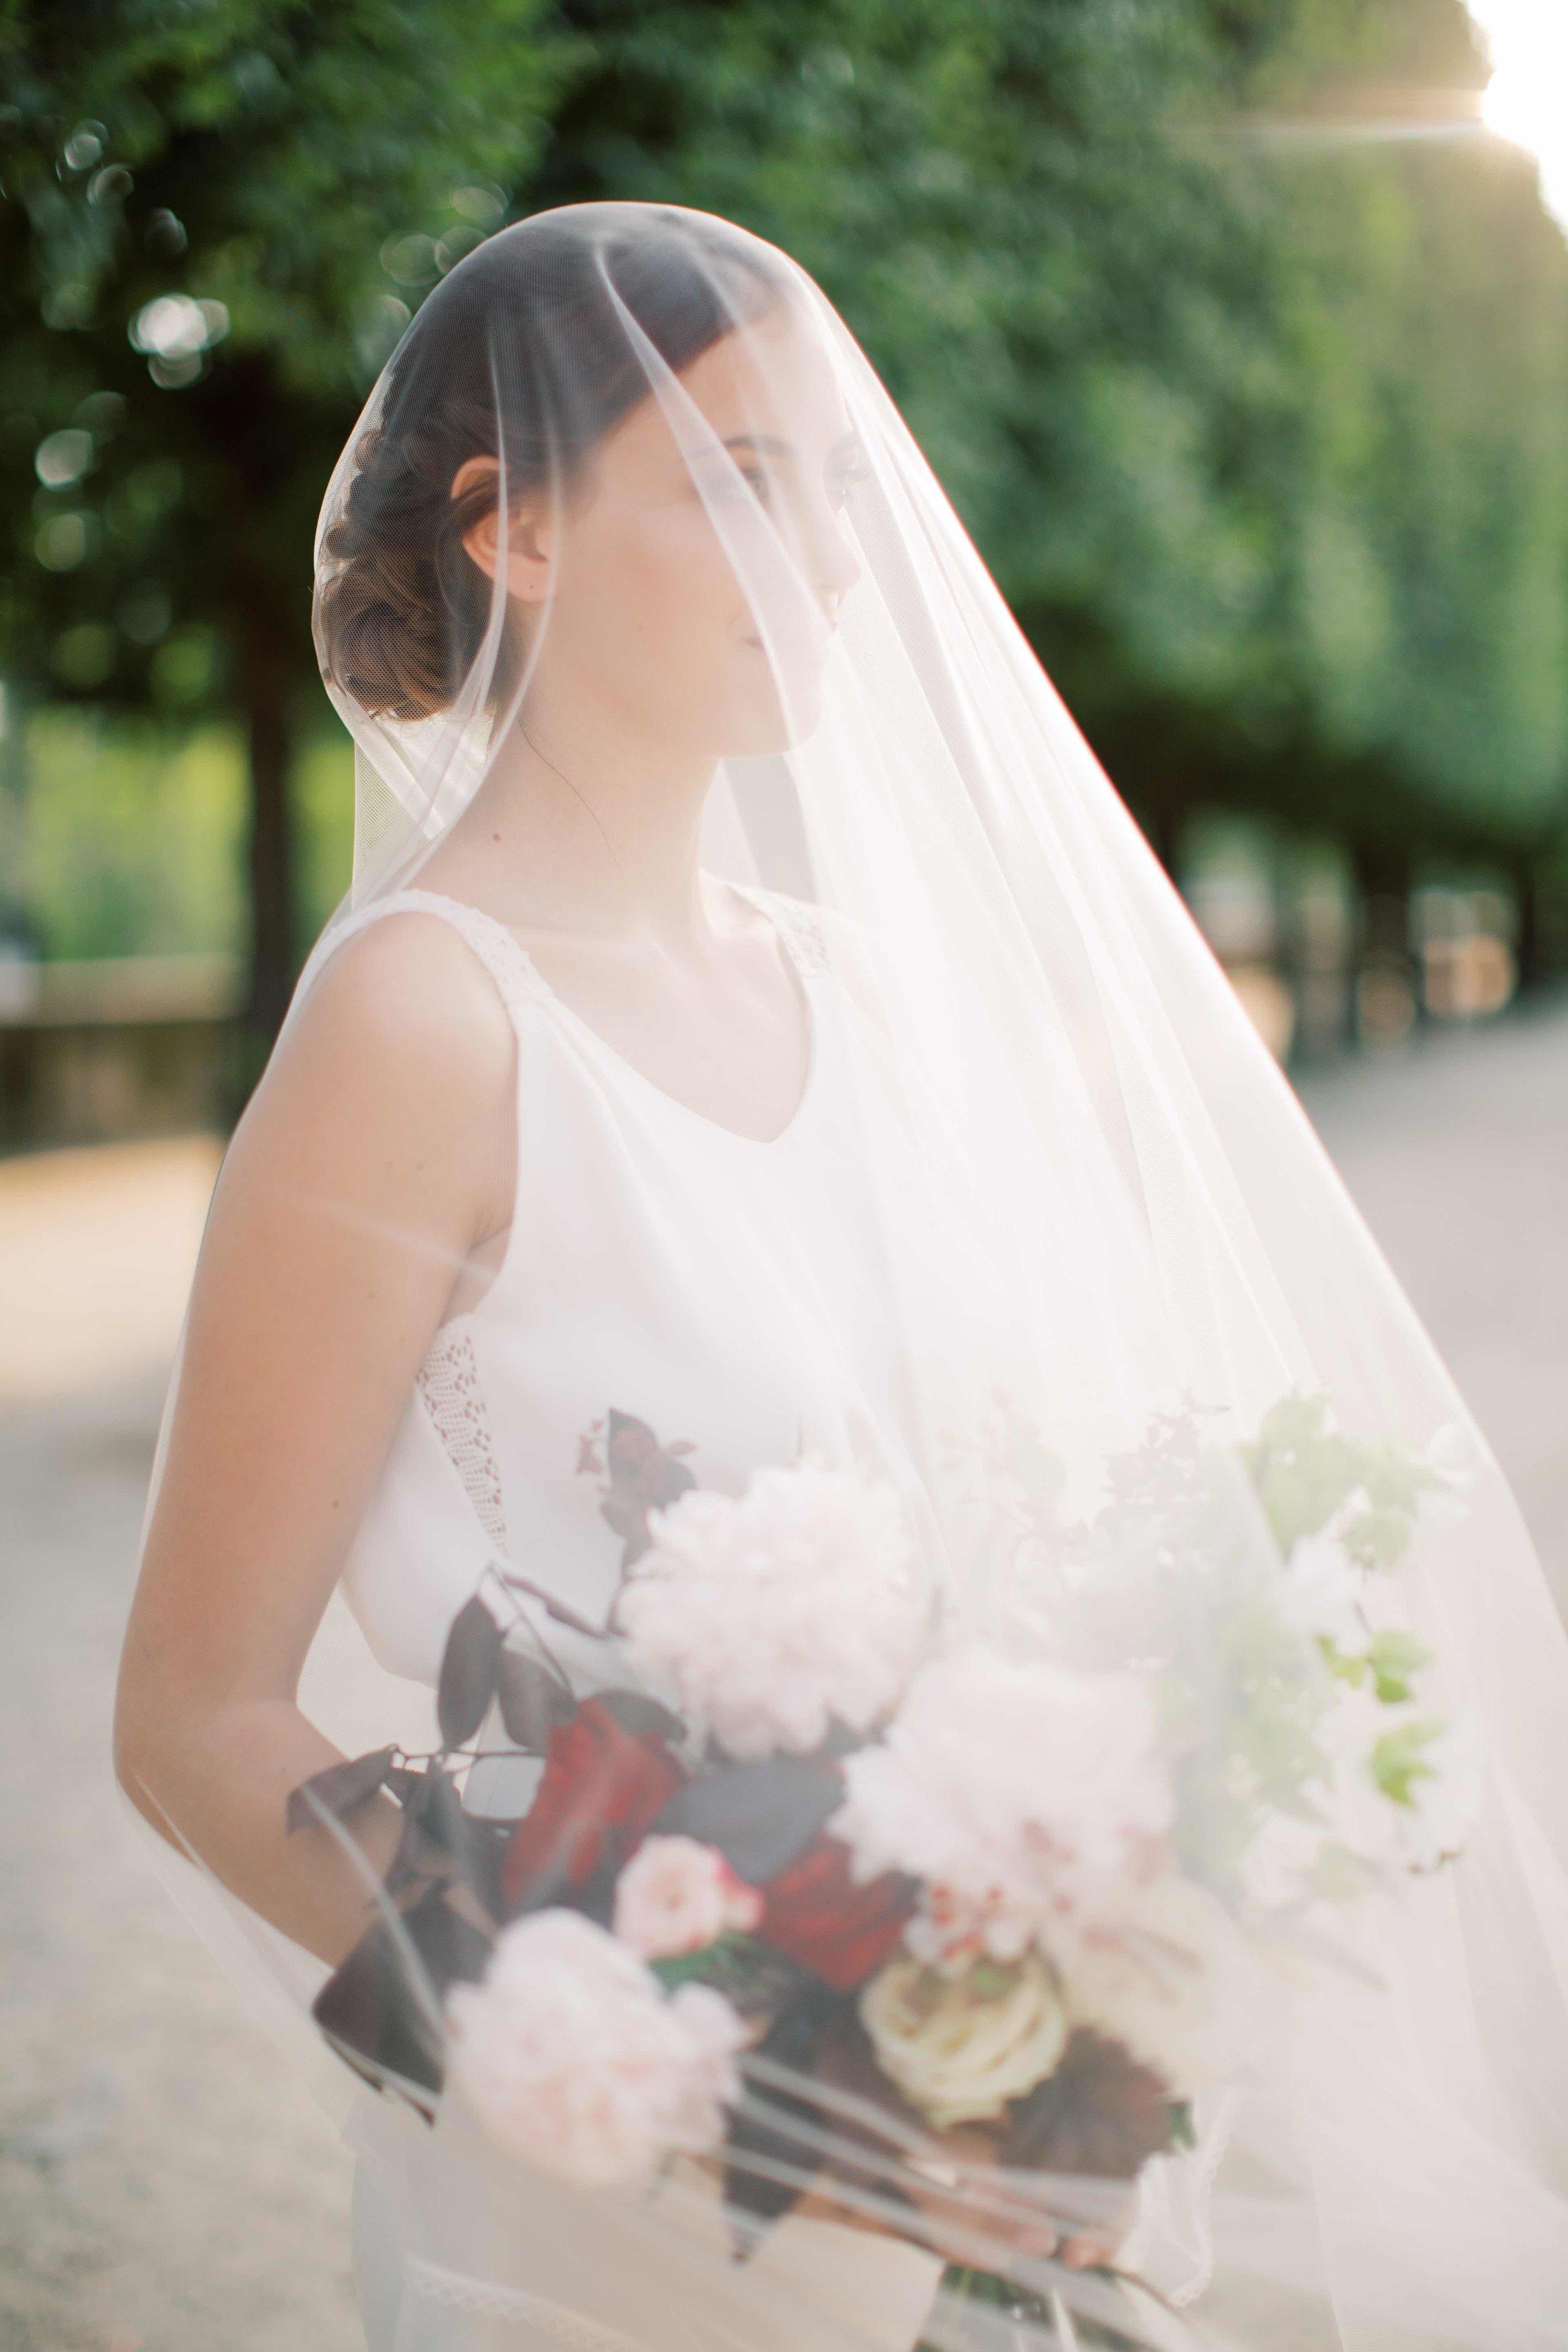 AmeliaClairePhotography_paris-1-64.jpeg